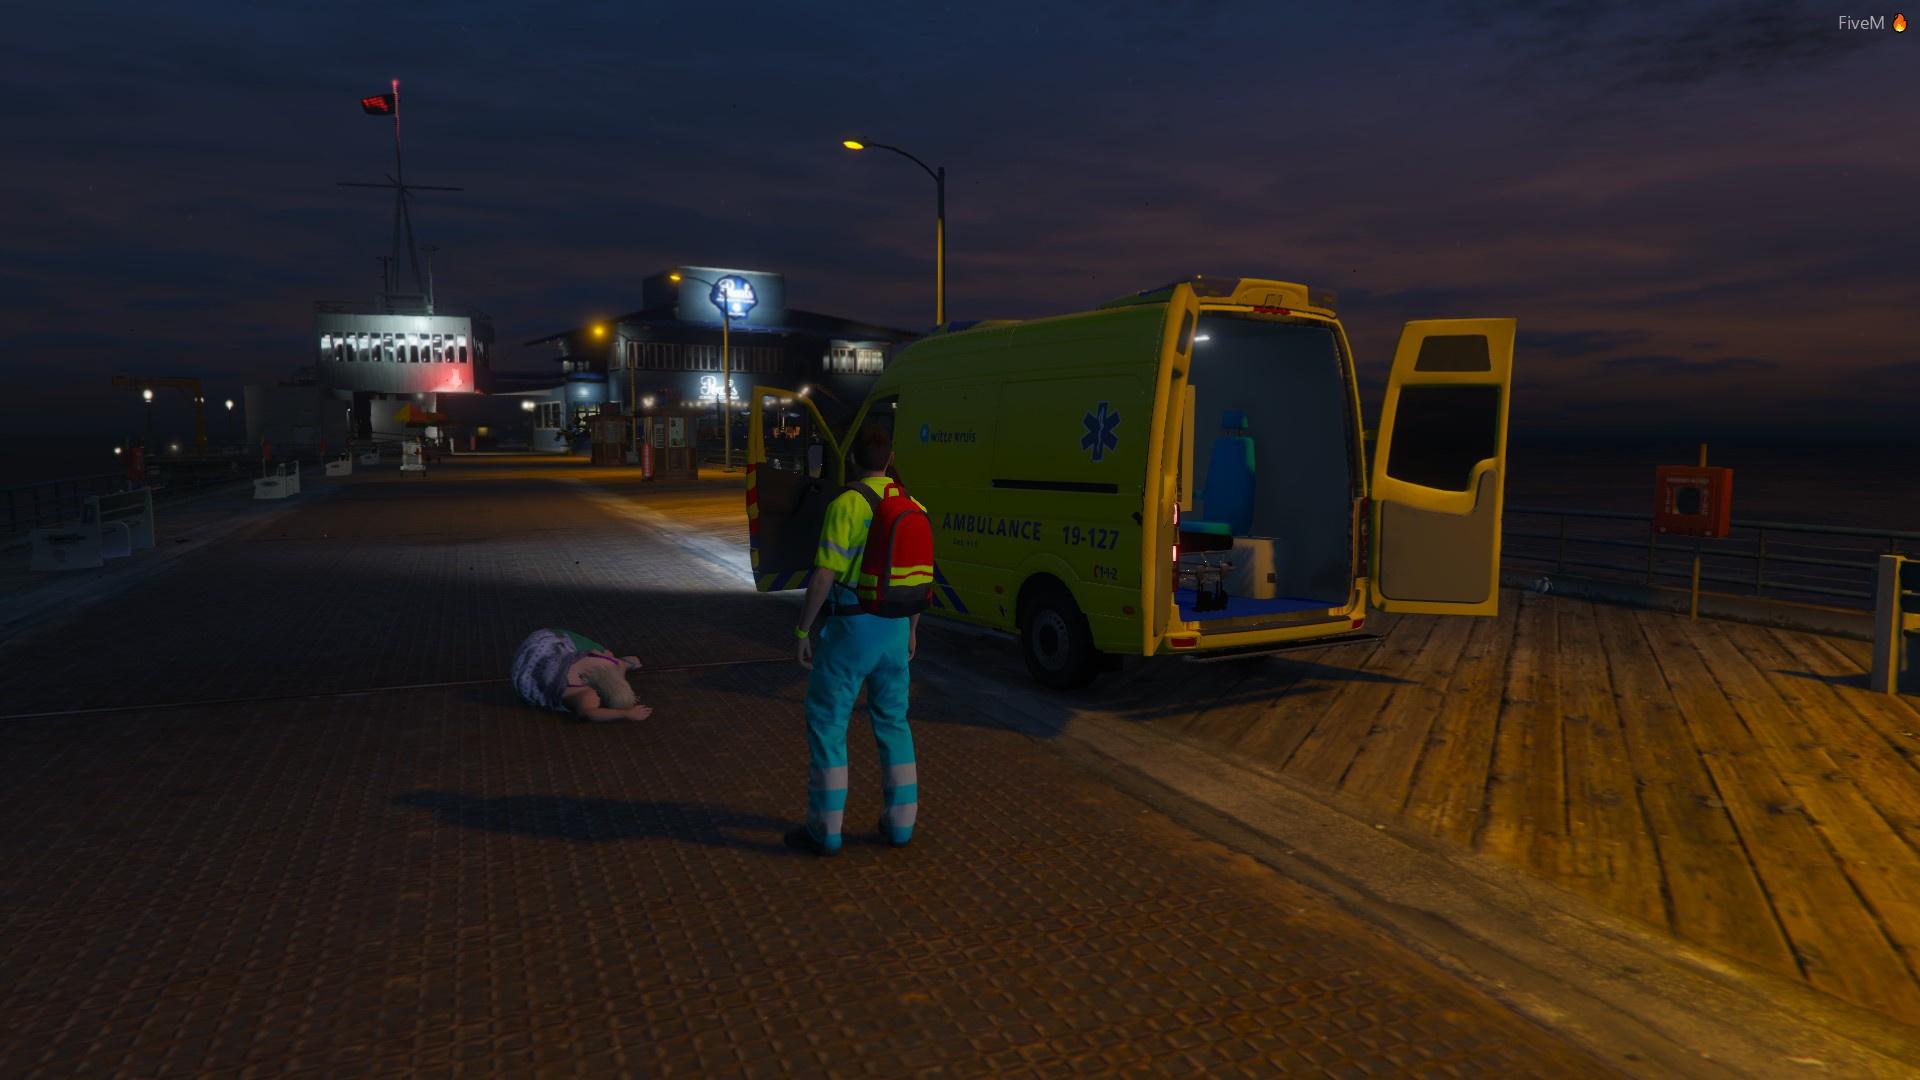 Ambulance job fivem